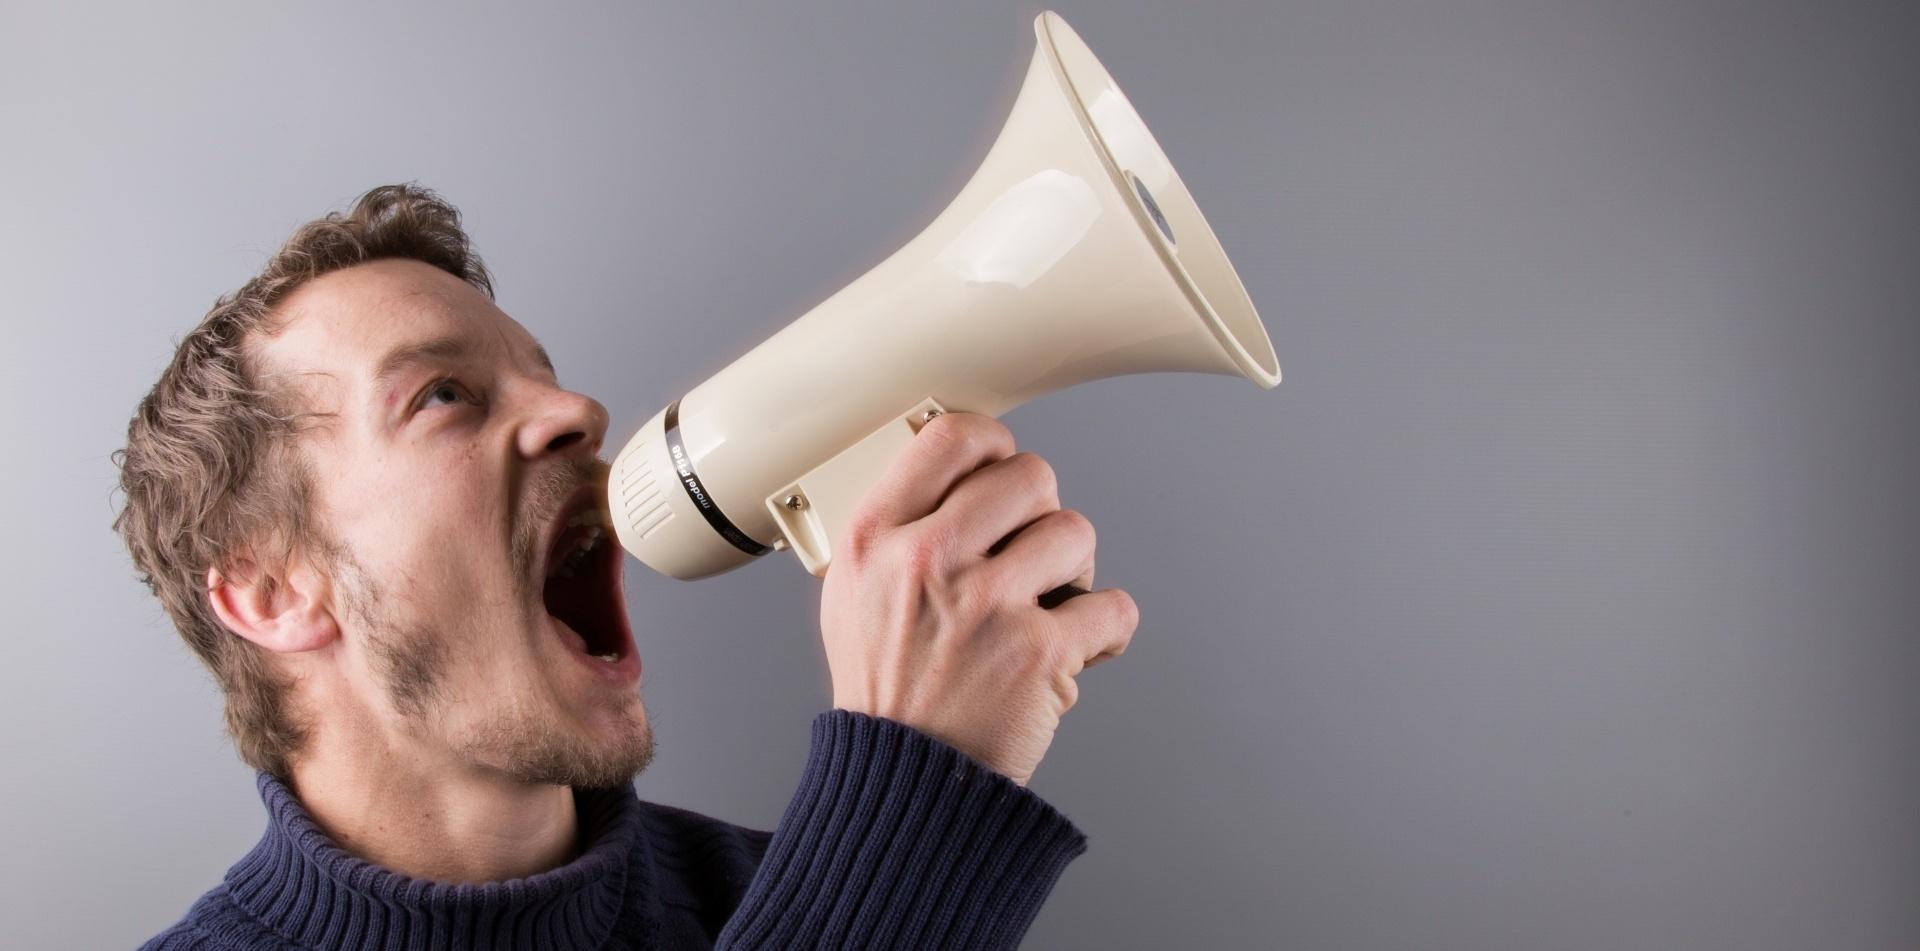 man screaming in megaphone